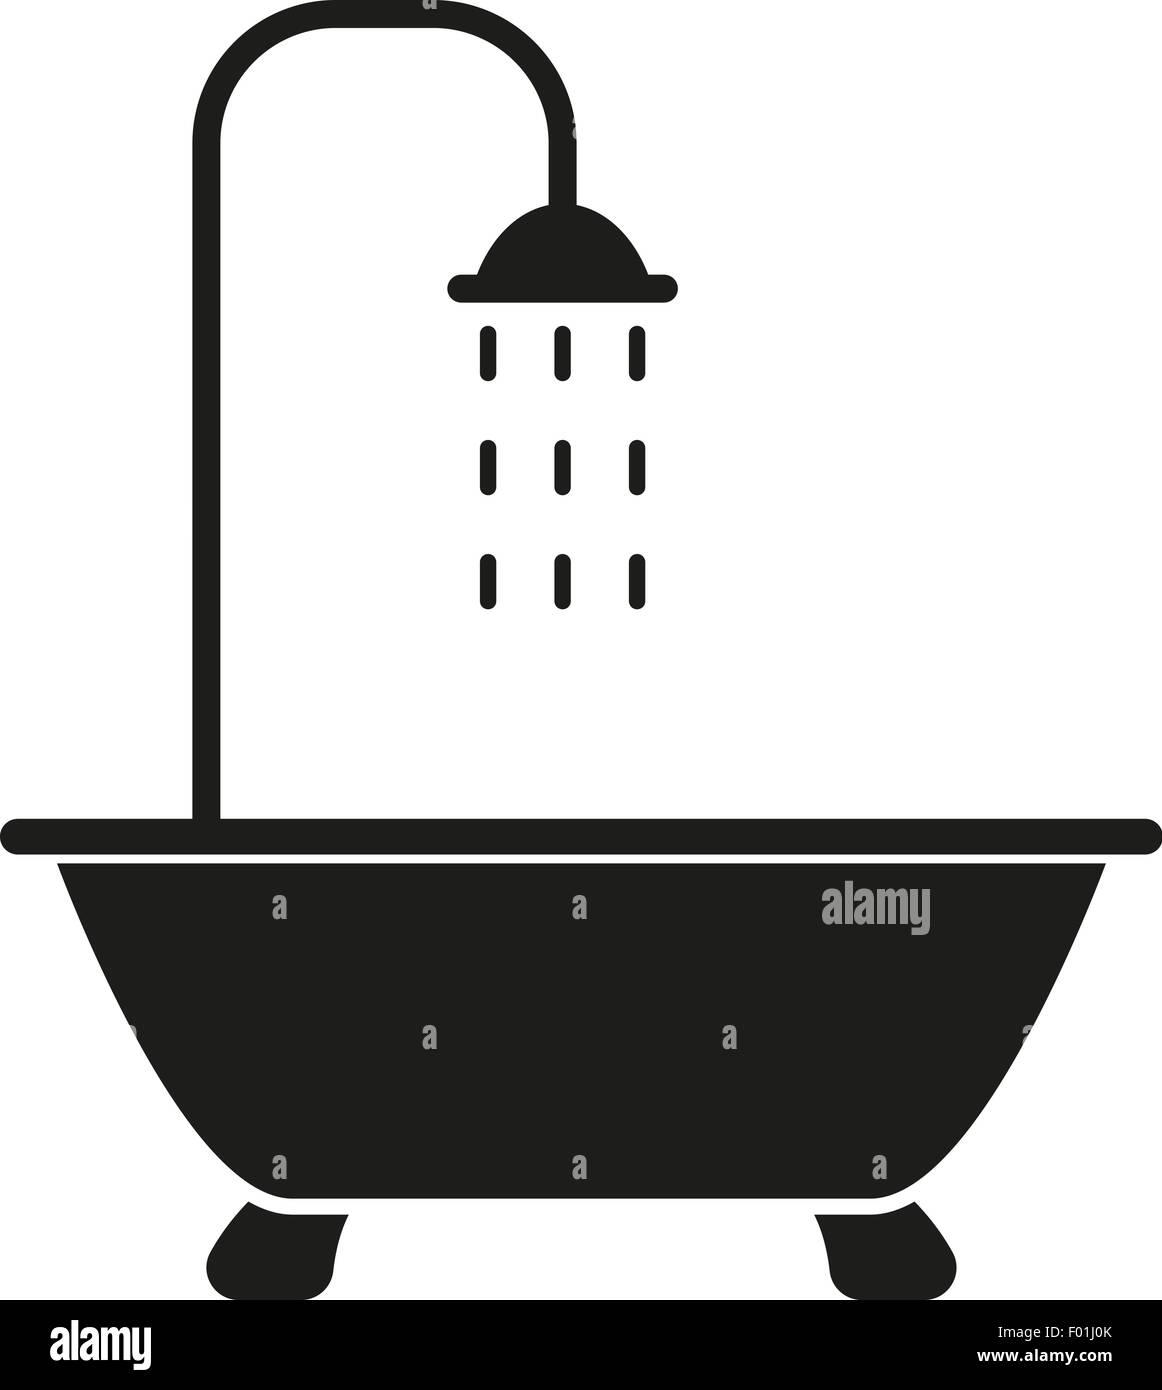 The Shower Icon Bathroom Symbol Flat Stock Vector Image Art Alamy